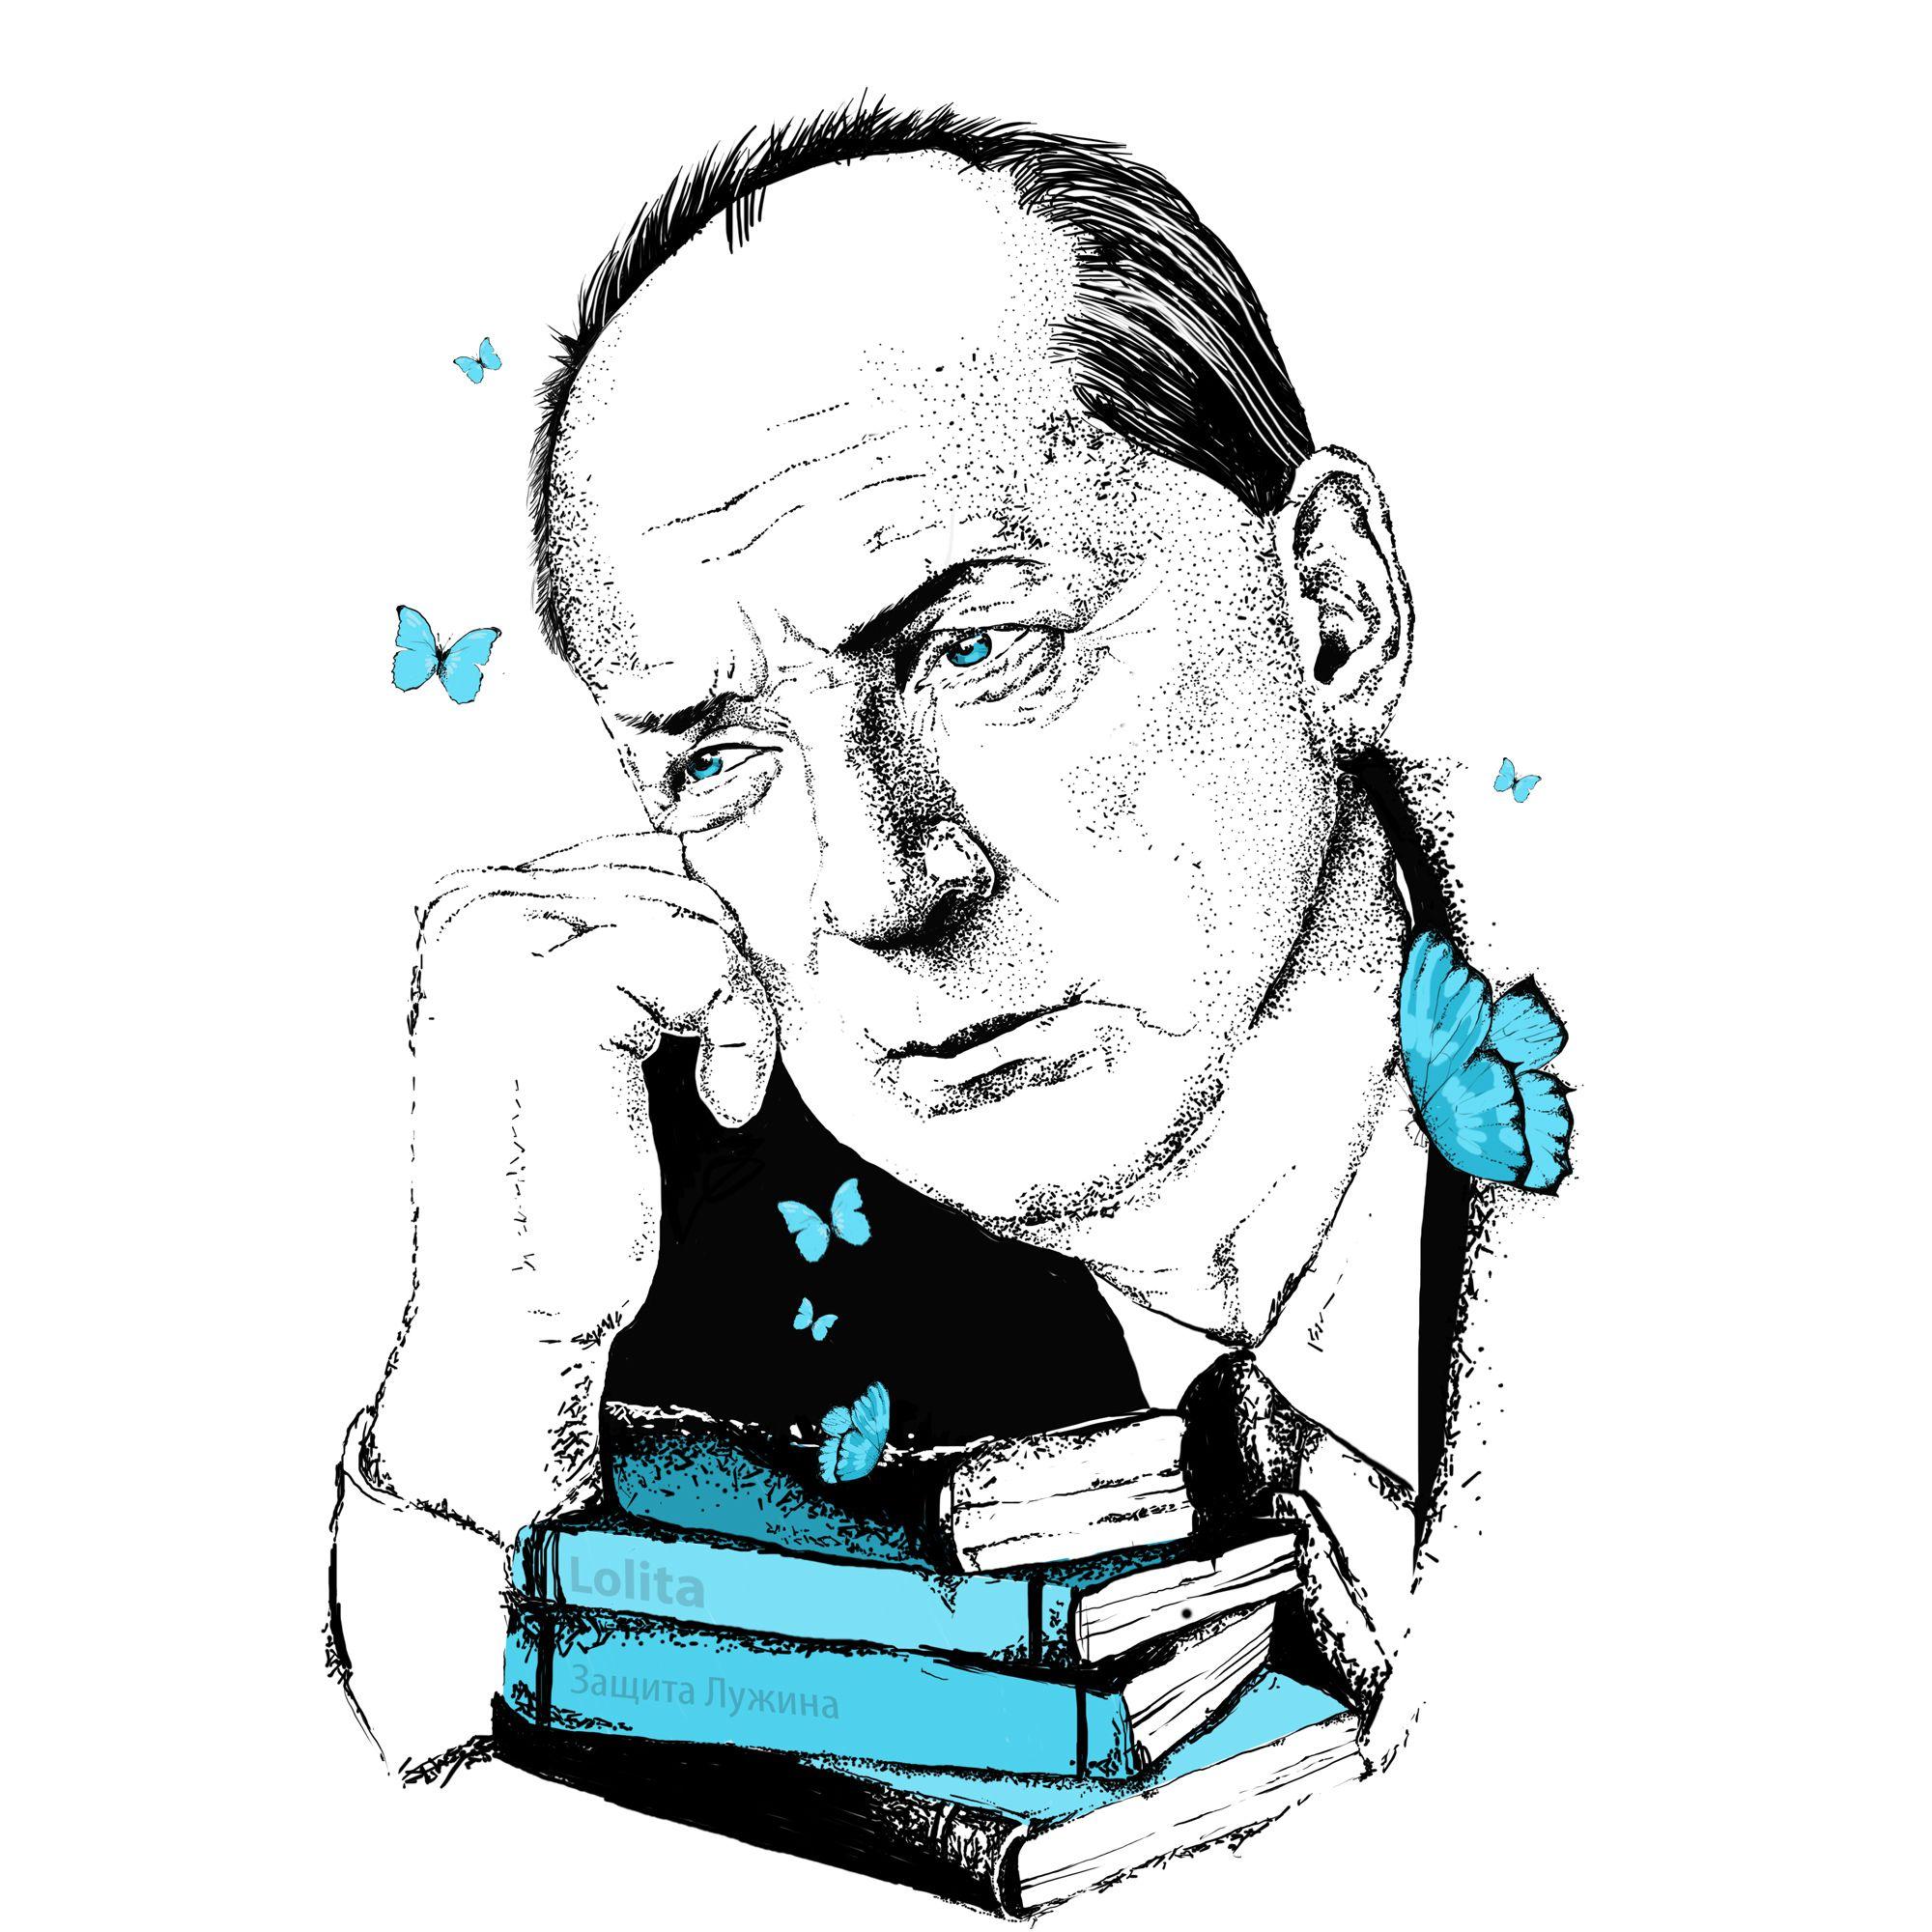 Плакат-портрет Владимира Набокова - дизайнер kolotova